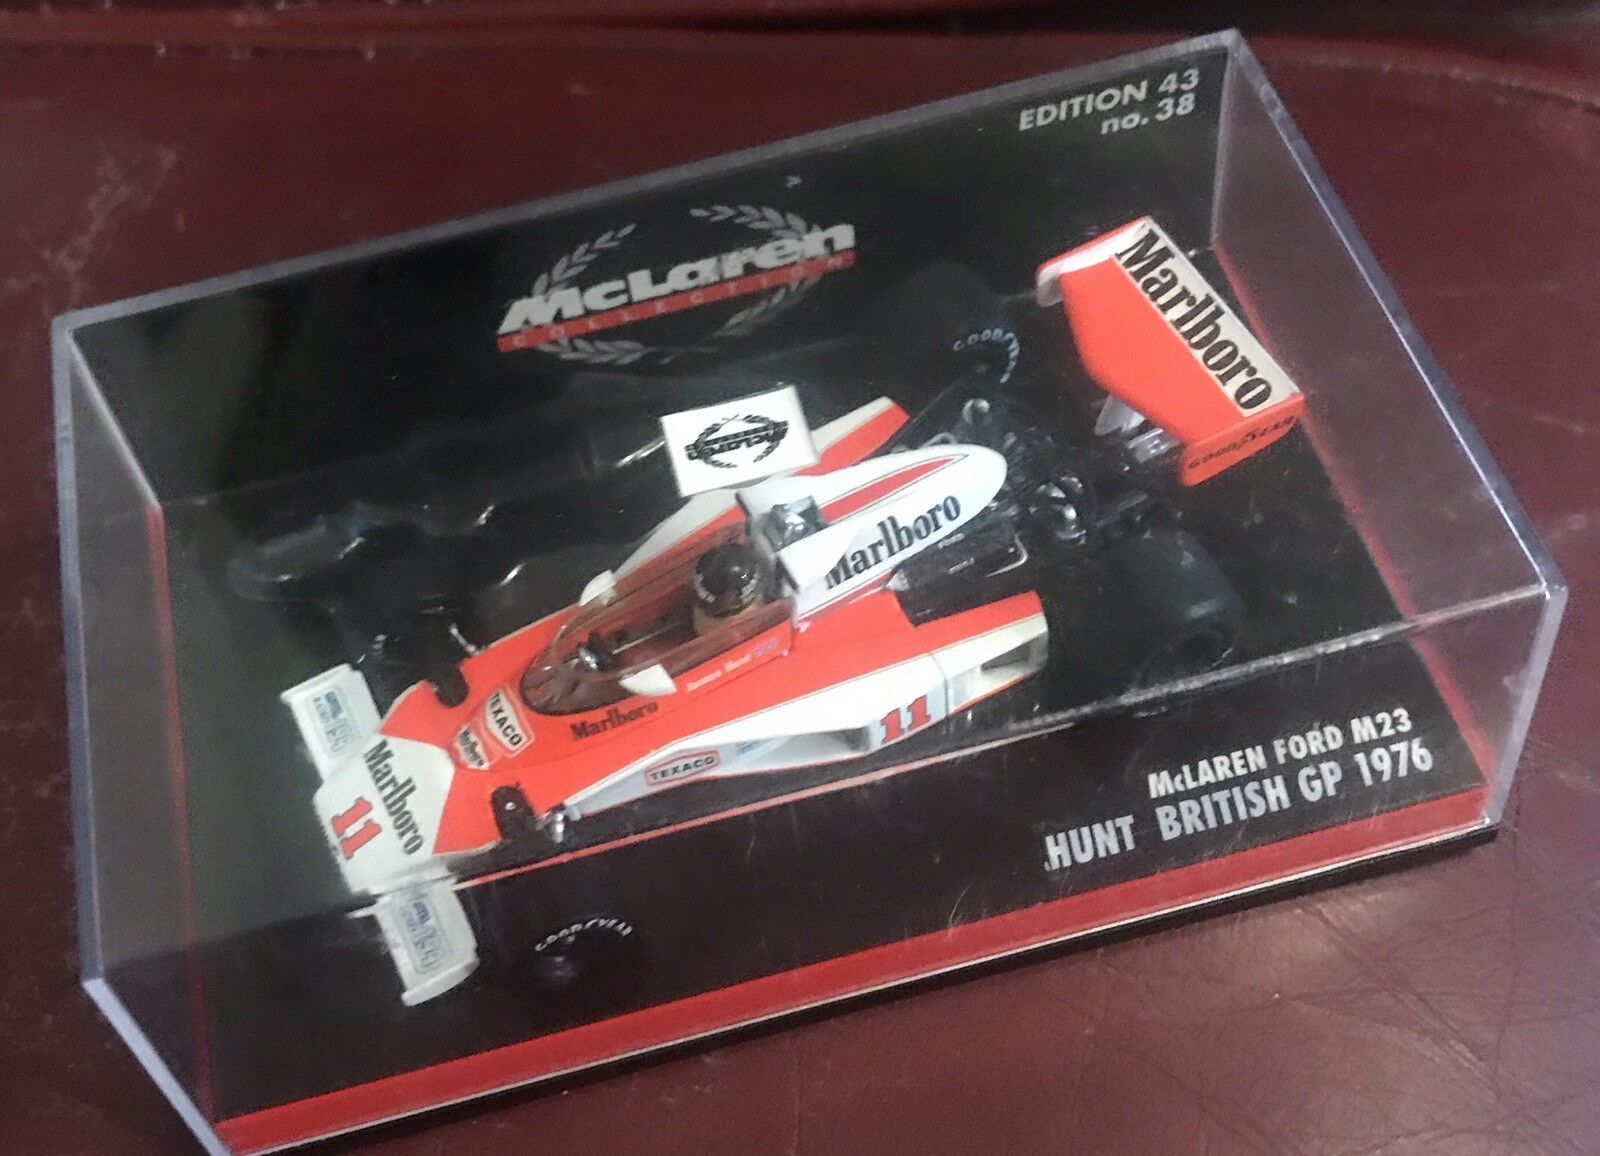 James Hunt Minichamps M23 British GP 1976